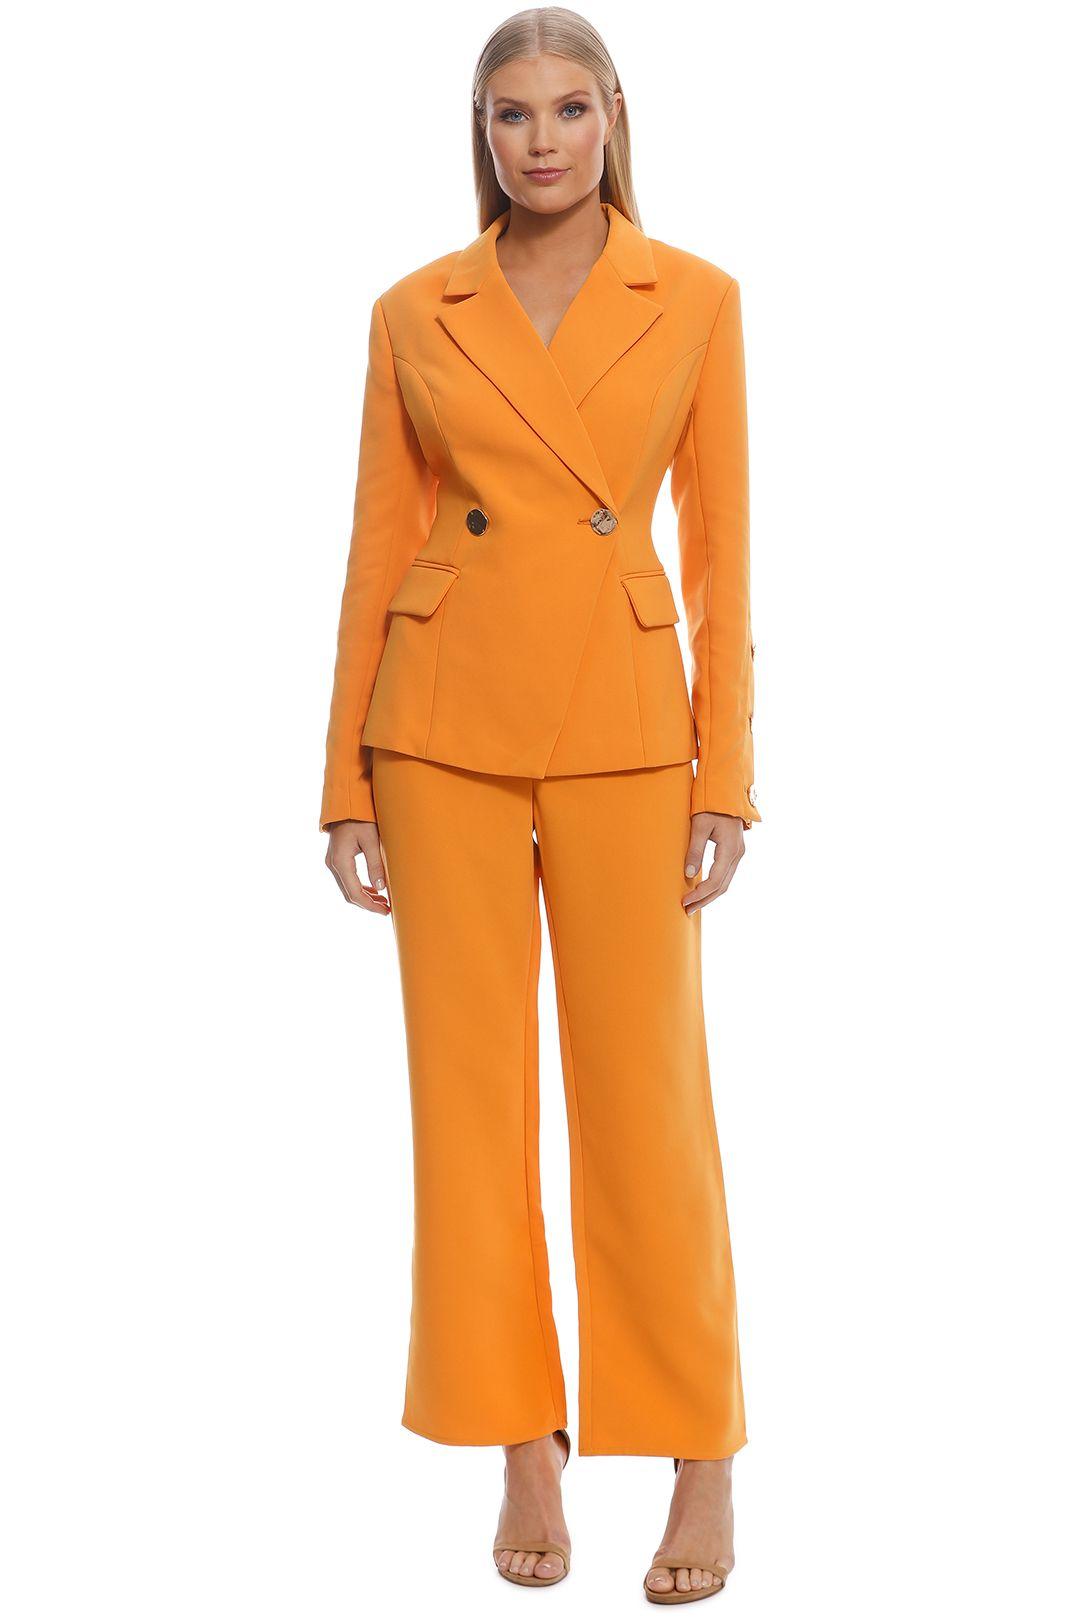 Keepsake The Label - Follower Blazer and Pant Set - Orange - Front